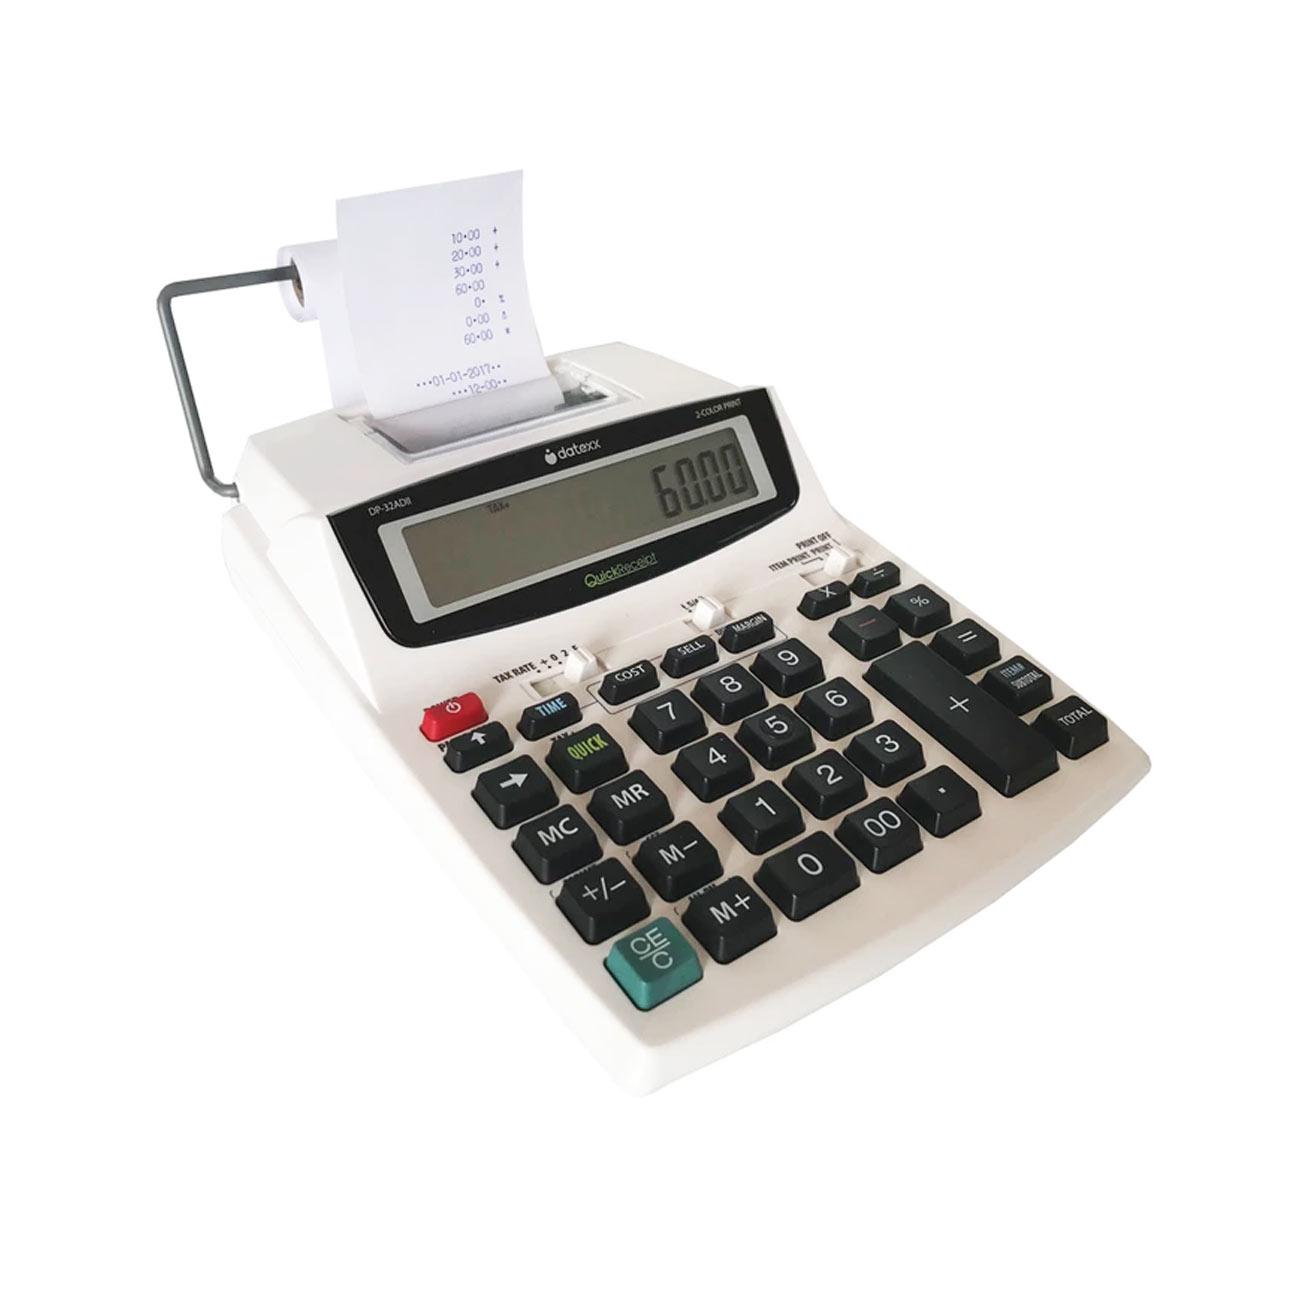 Portable 12-Digit AC-DC 2-Color Printing Calculator